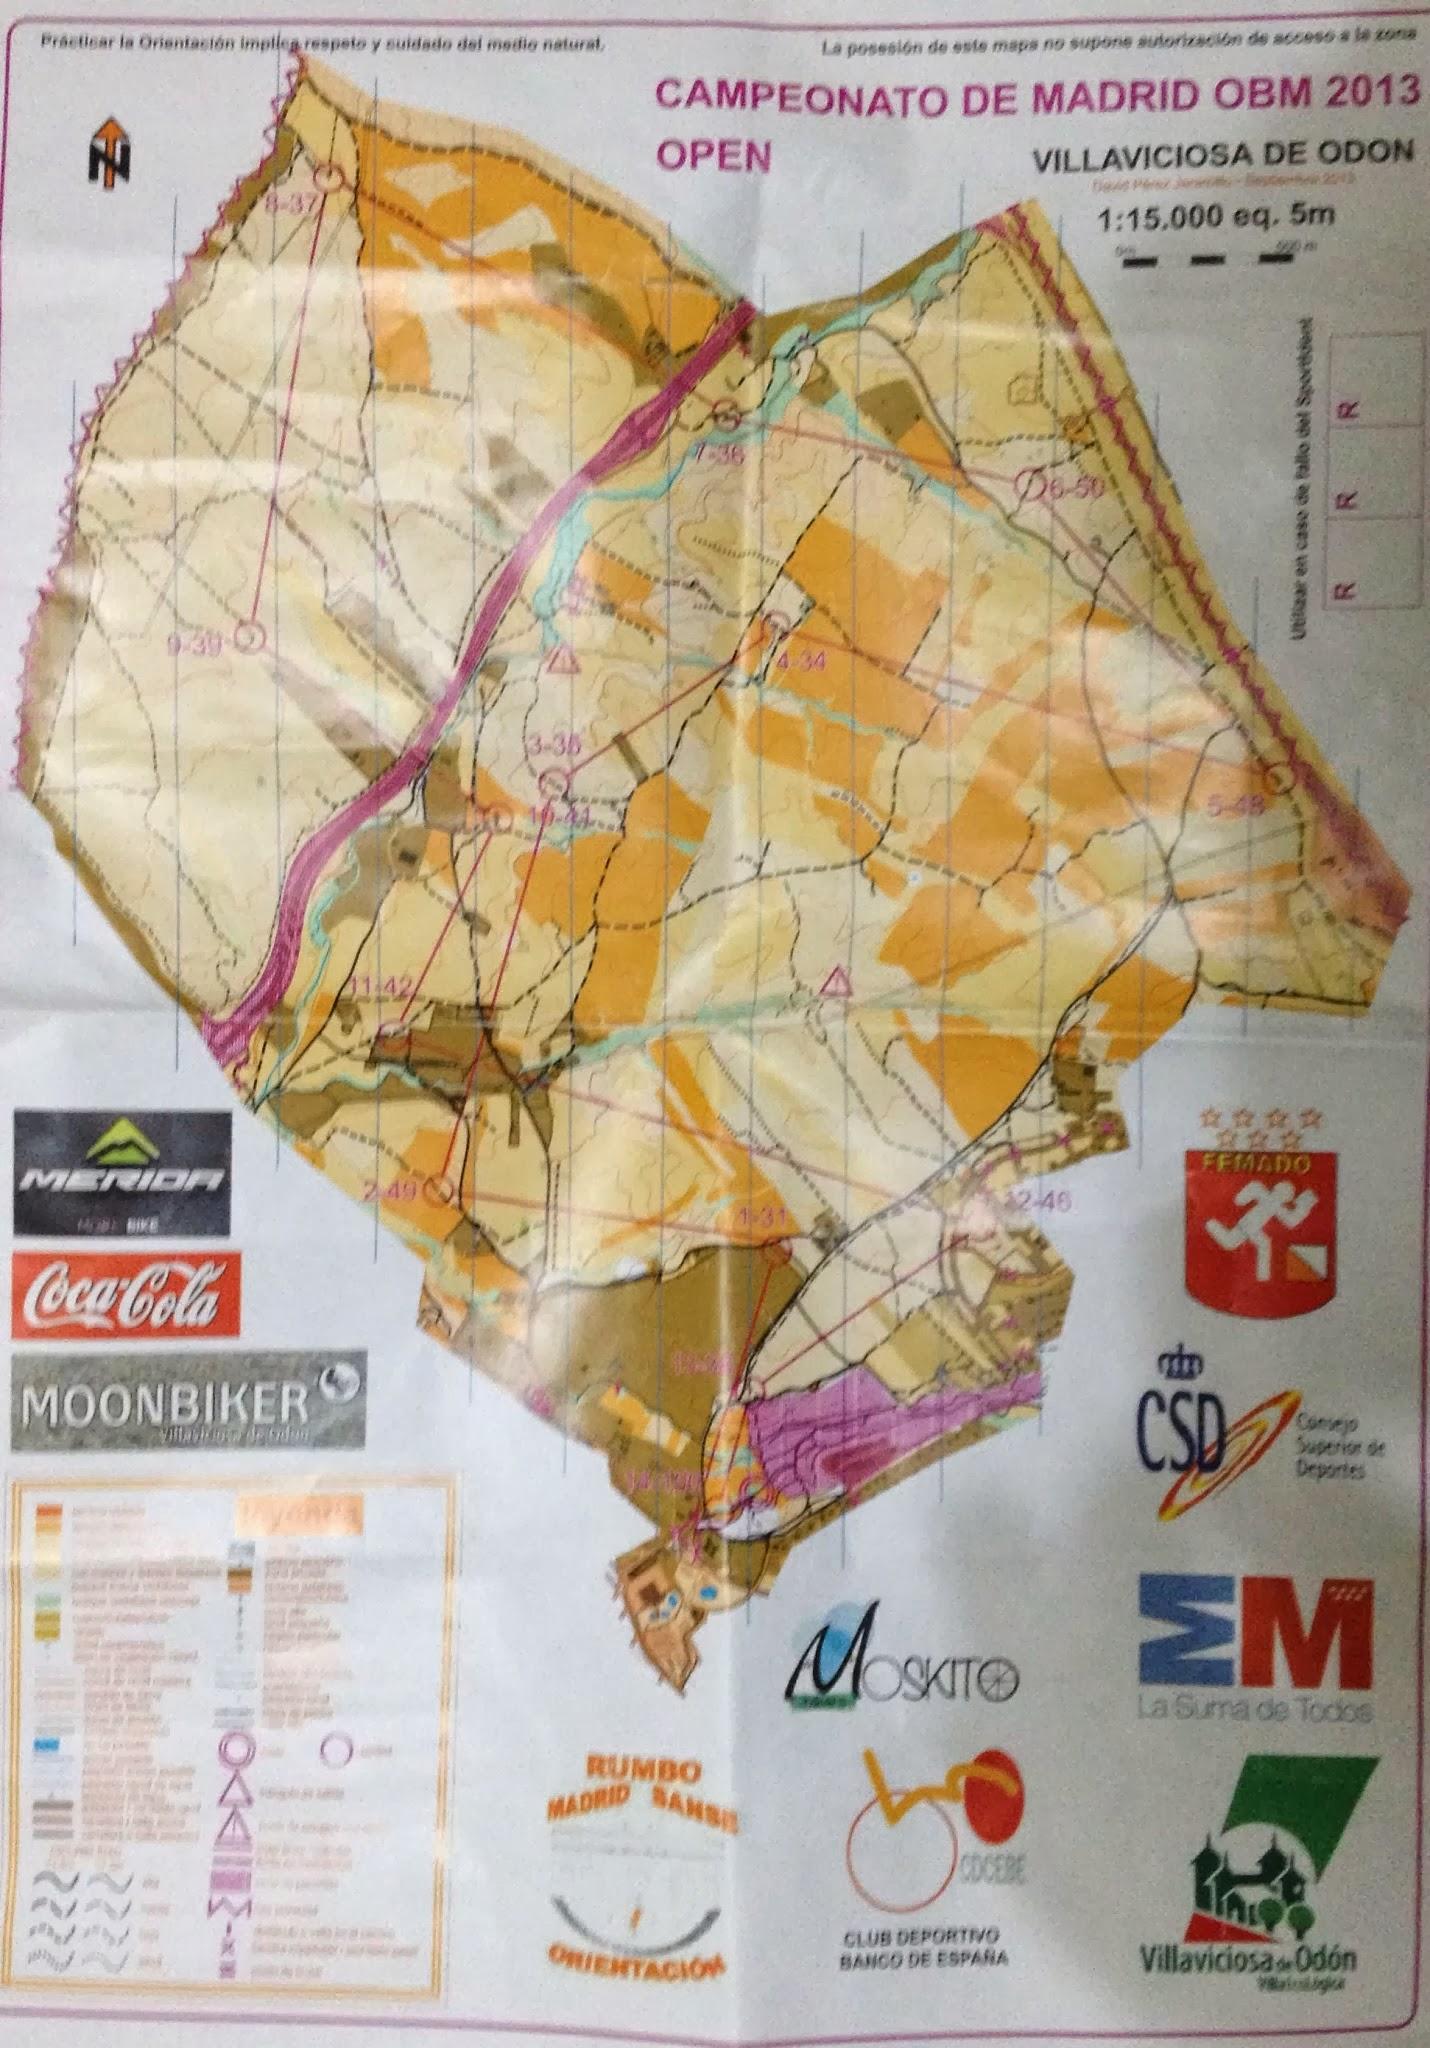 Mapa Villaviciosa De Odon.Villaviciosa De Odon Campeonato De Madrid De Obm 2013